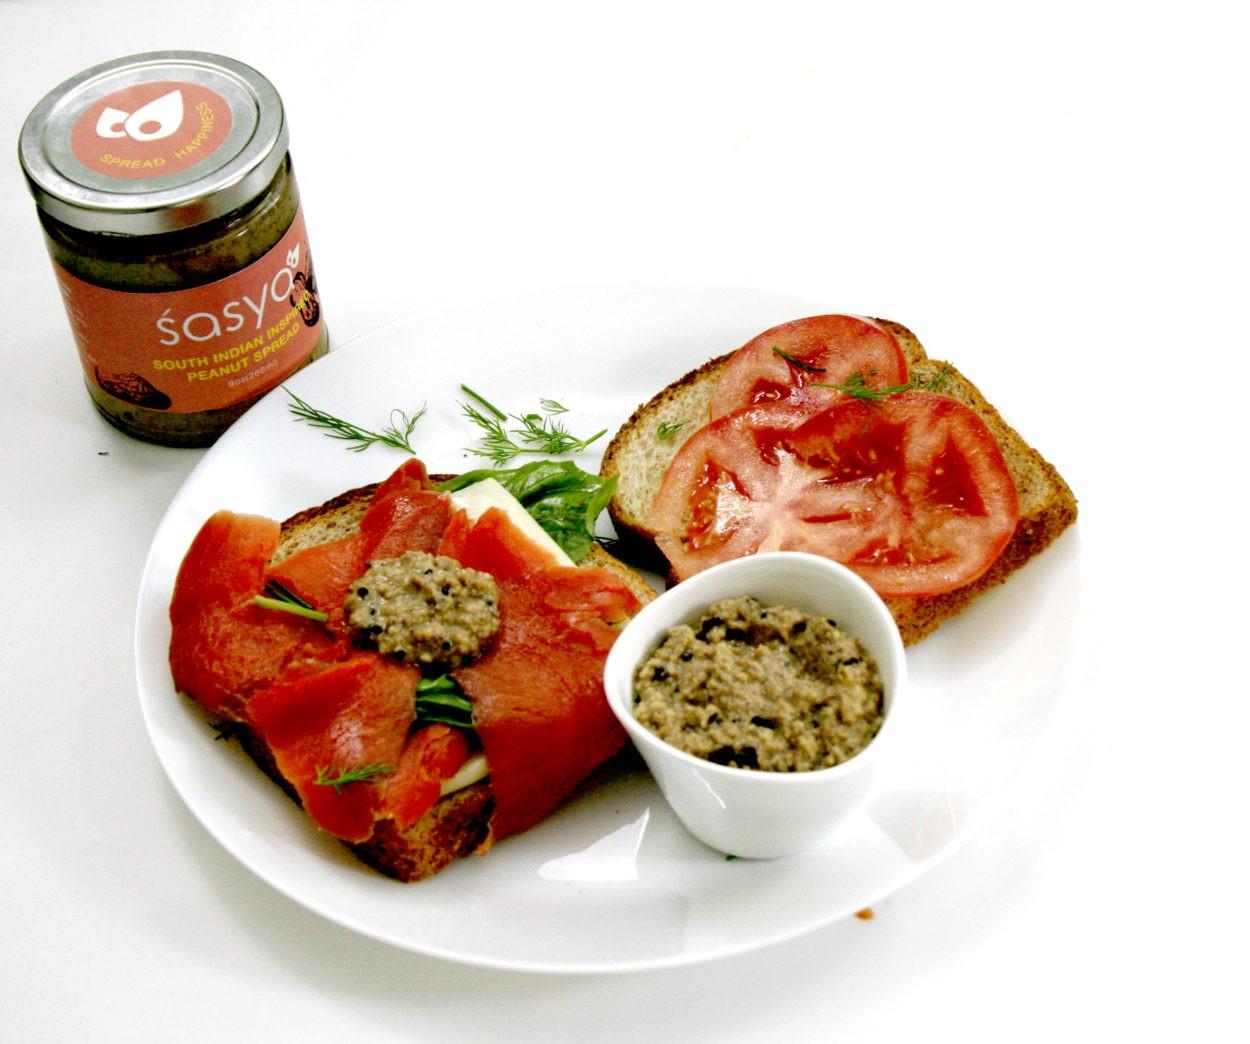 Image of smoked salmon sandwich with Sasya Peanut Spread